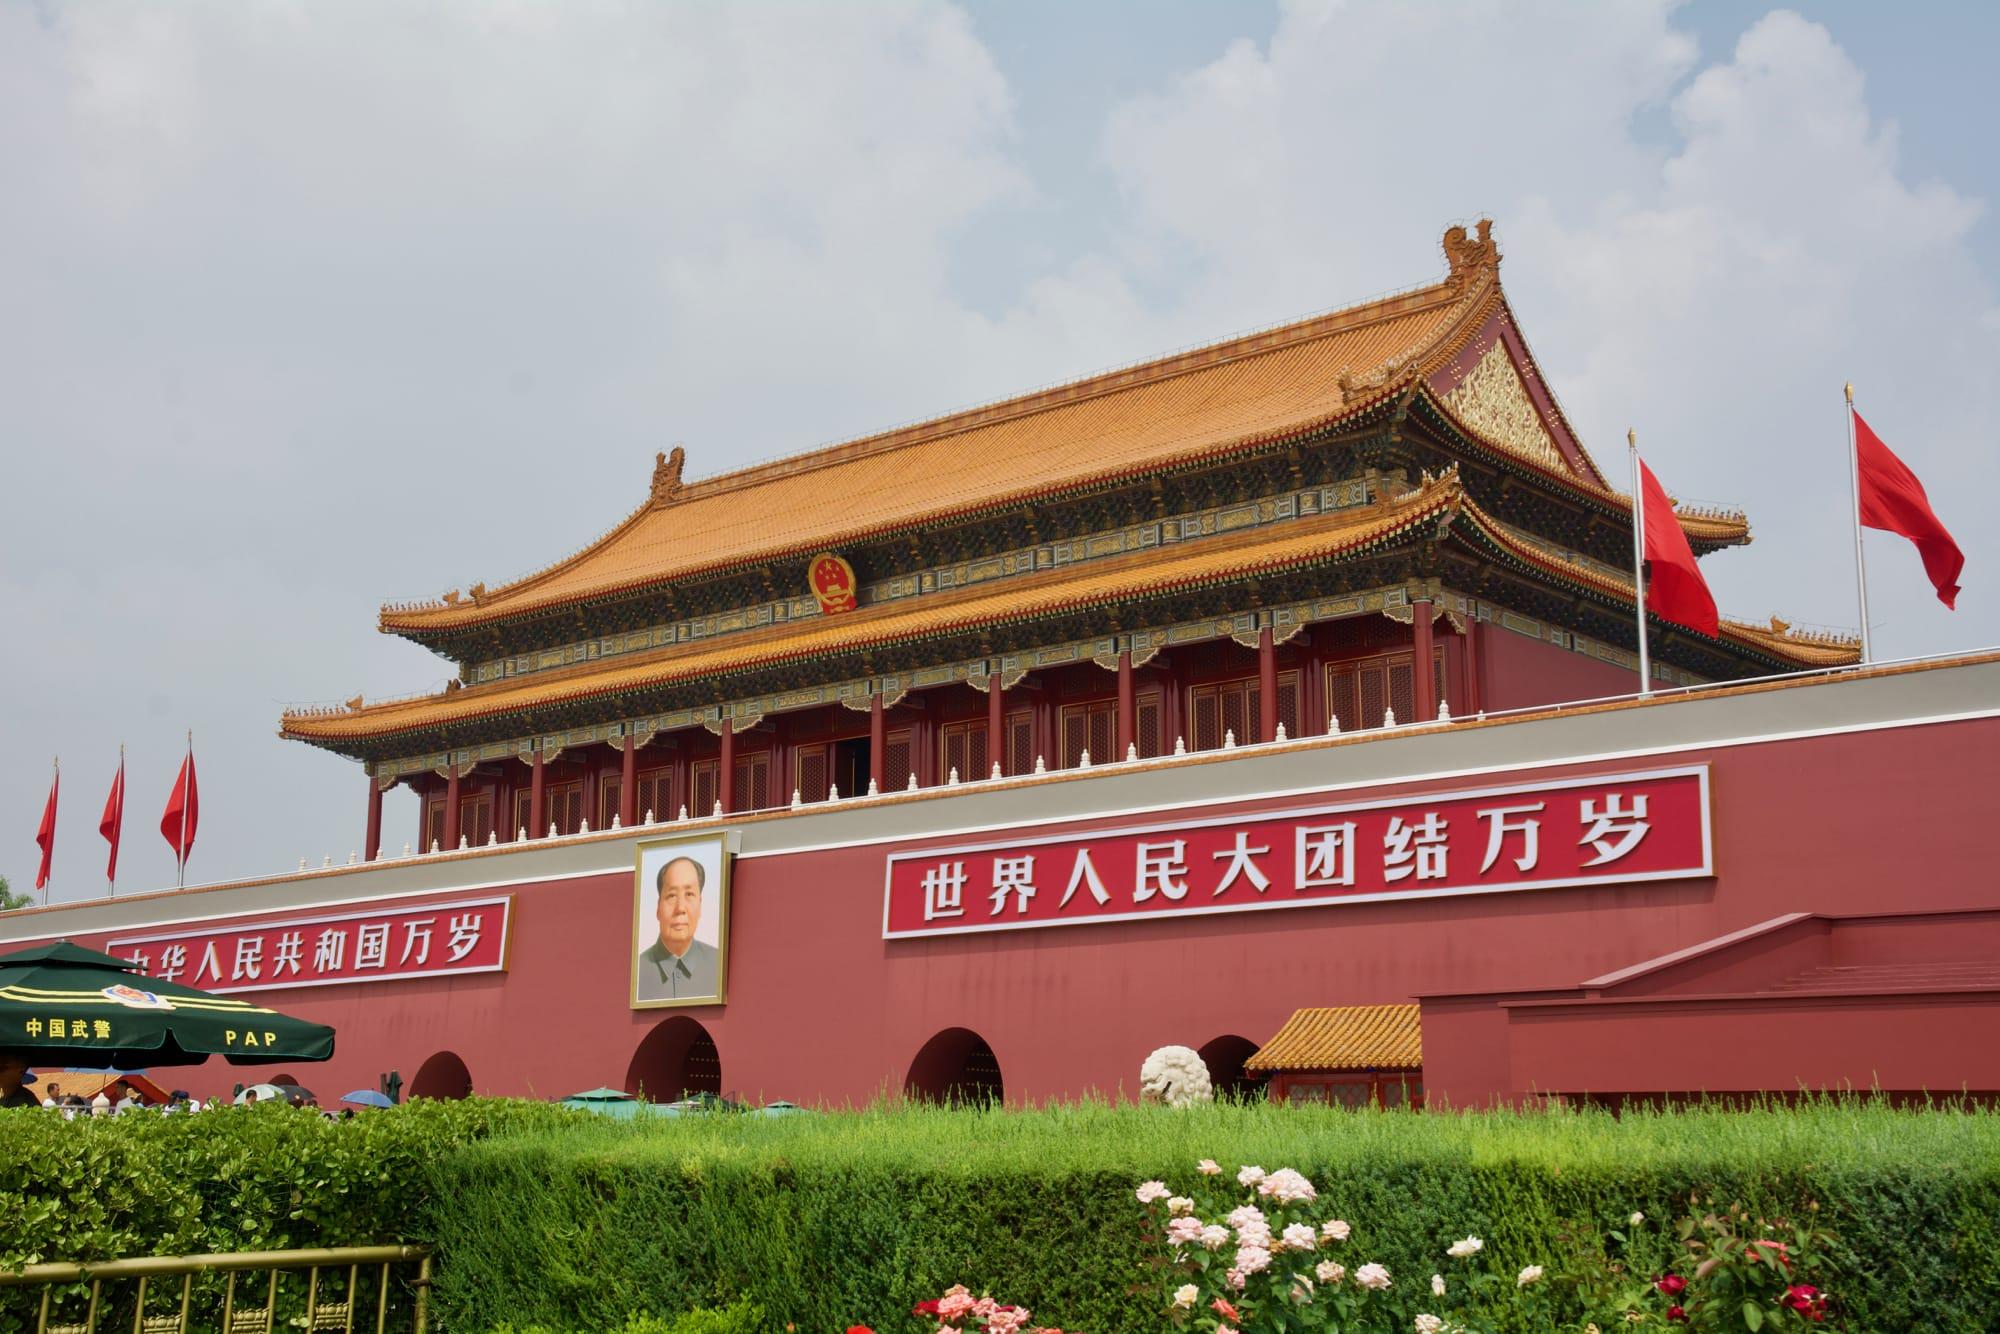 Beijing: i Palazzi Imperiali